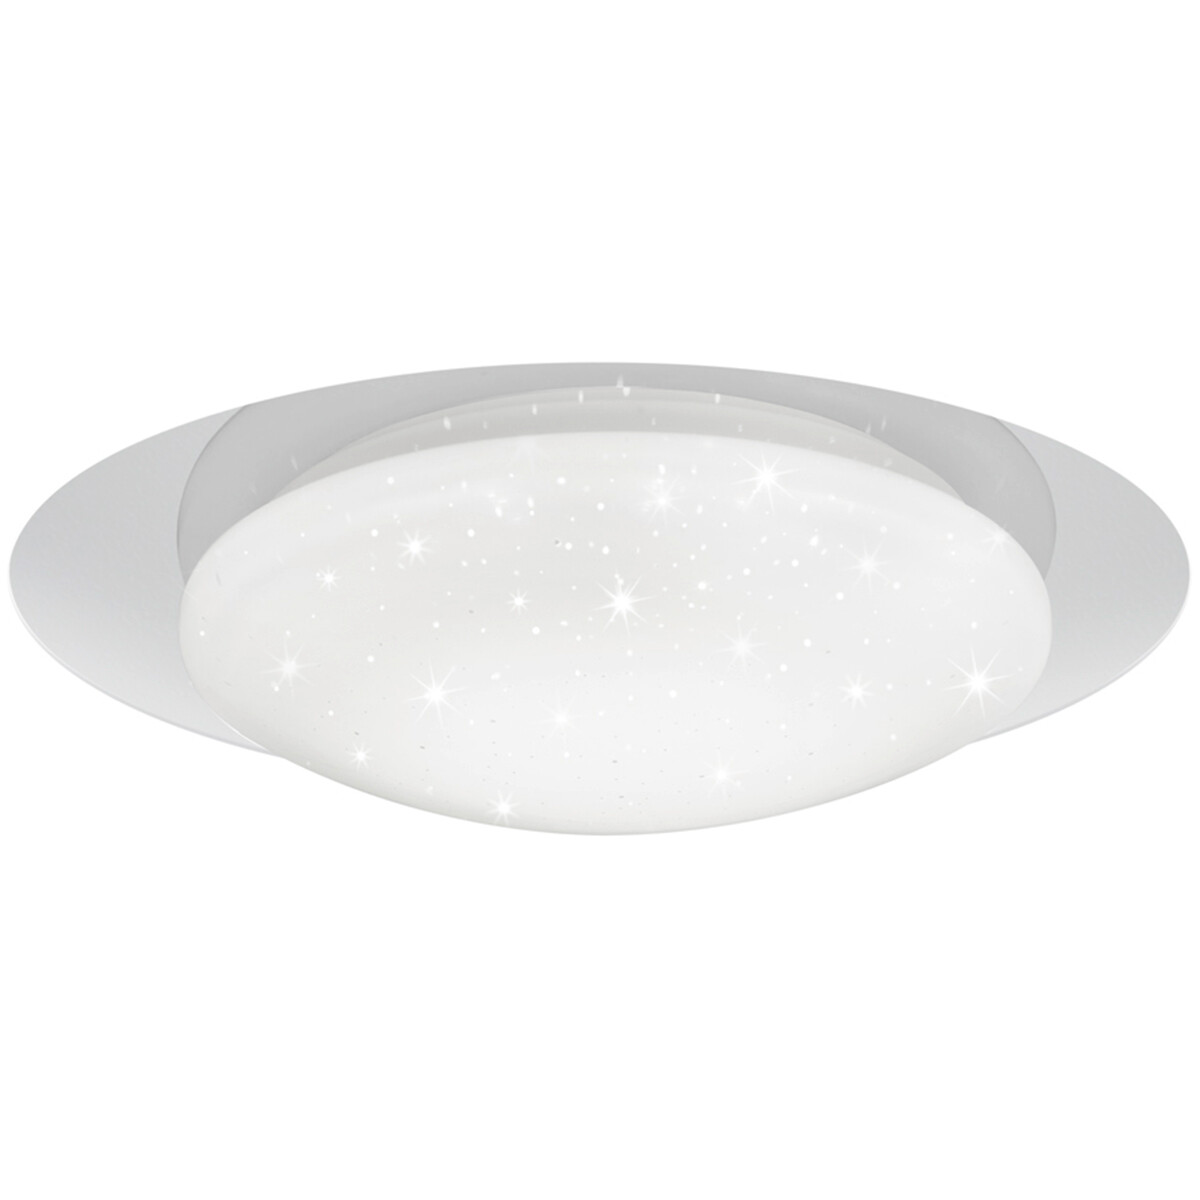 LED Plafondlamp - Plafondverlichting - Trion Frida - 26W - Aanpasbare Kleur - Dimbaar - Rond - Mat W